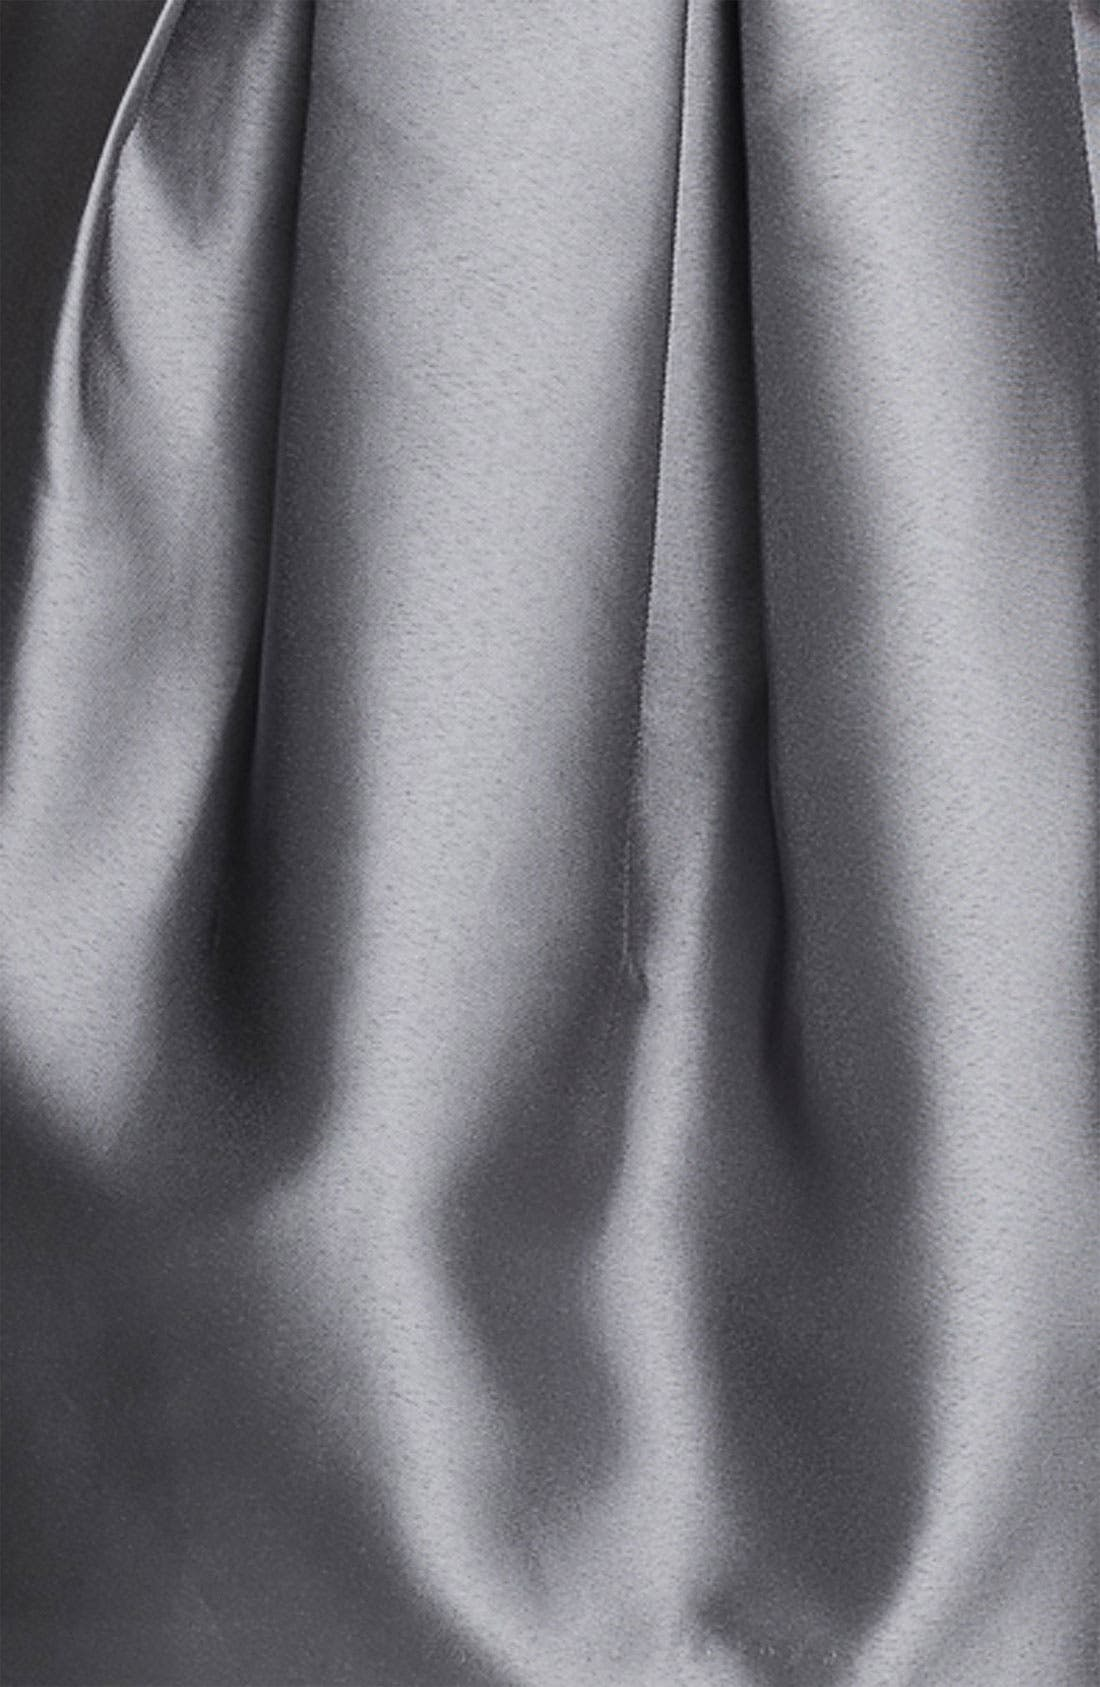 ELIZA J, Sweetheart Neckline Taffeta Tulip Dress, Alternate thumbnail 3, color, 040